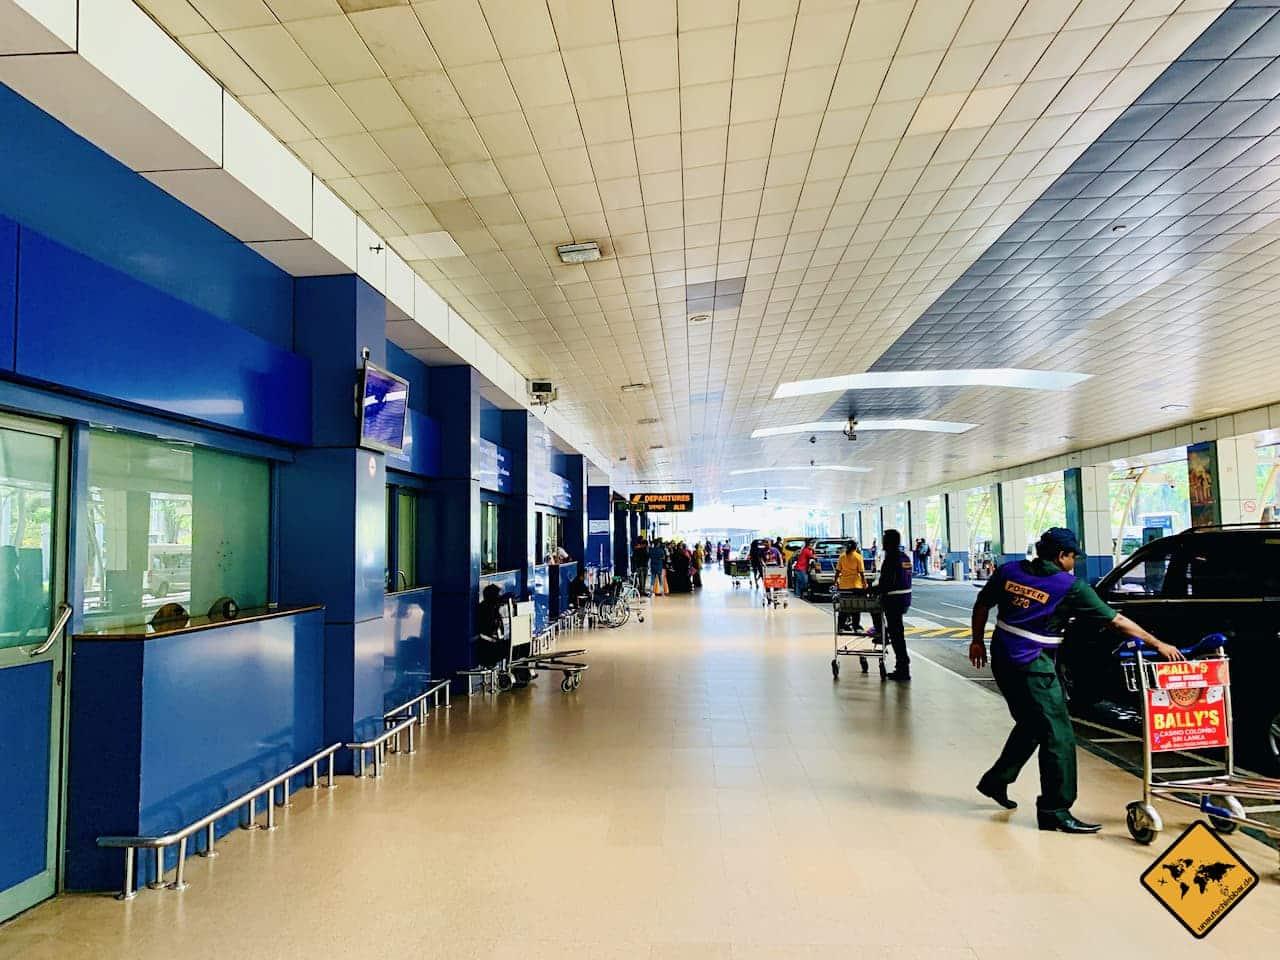 Sri Lanka Flughafen Colombo Einreise Corona